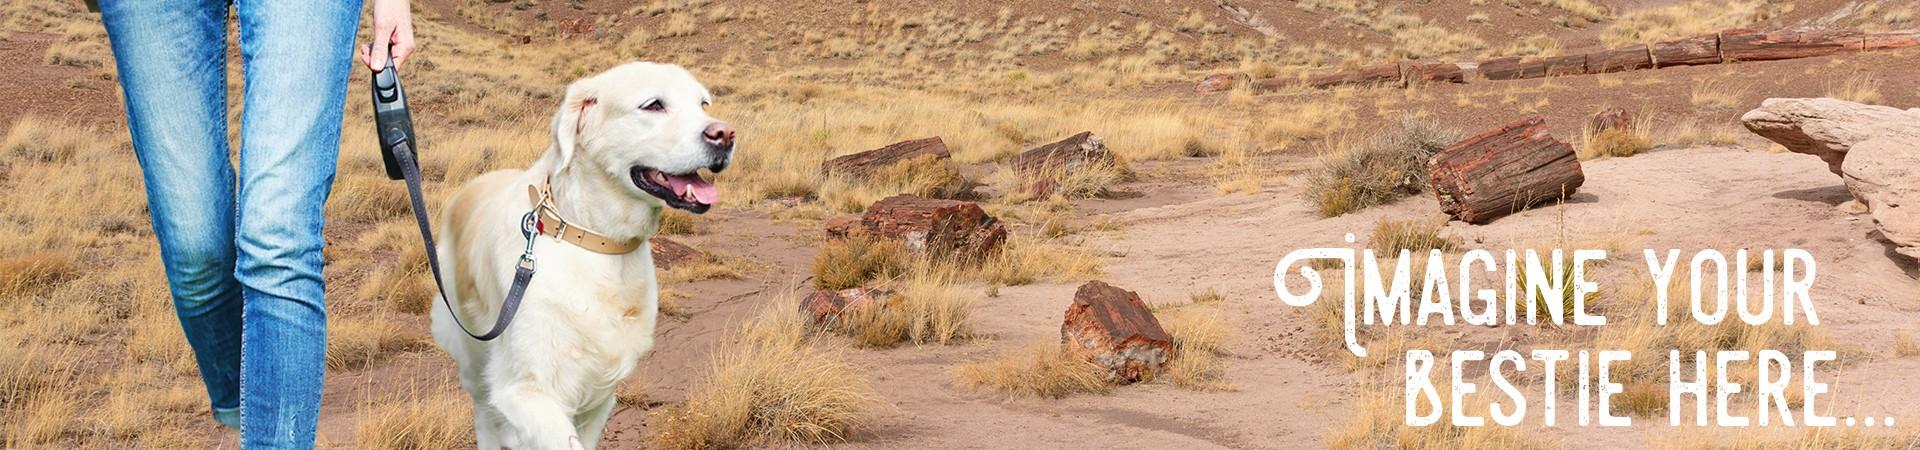 petrified-national-park-arizona